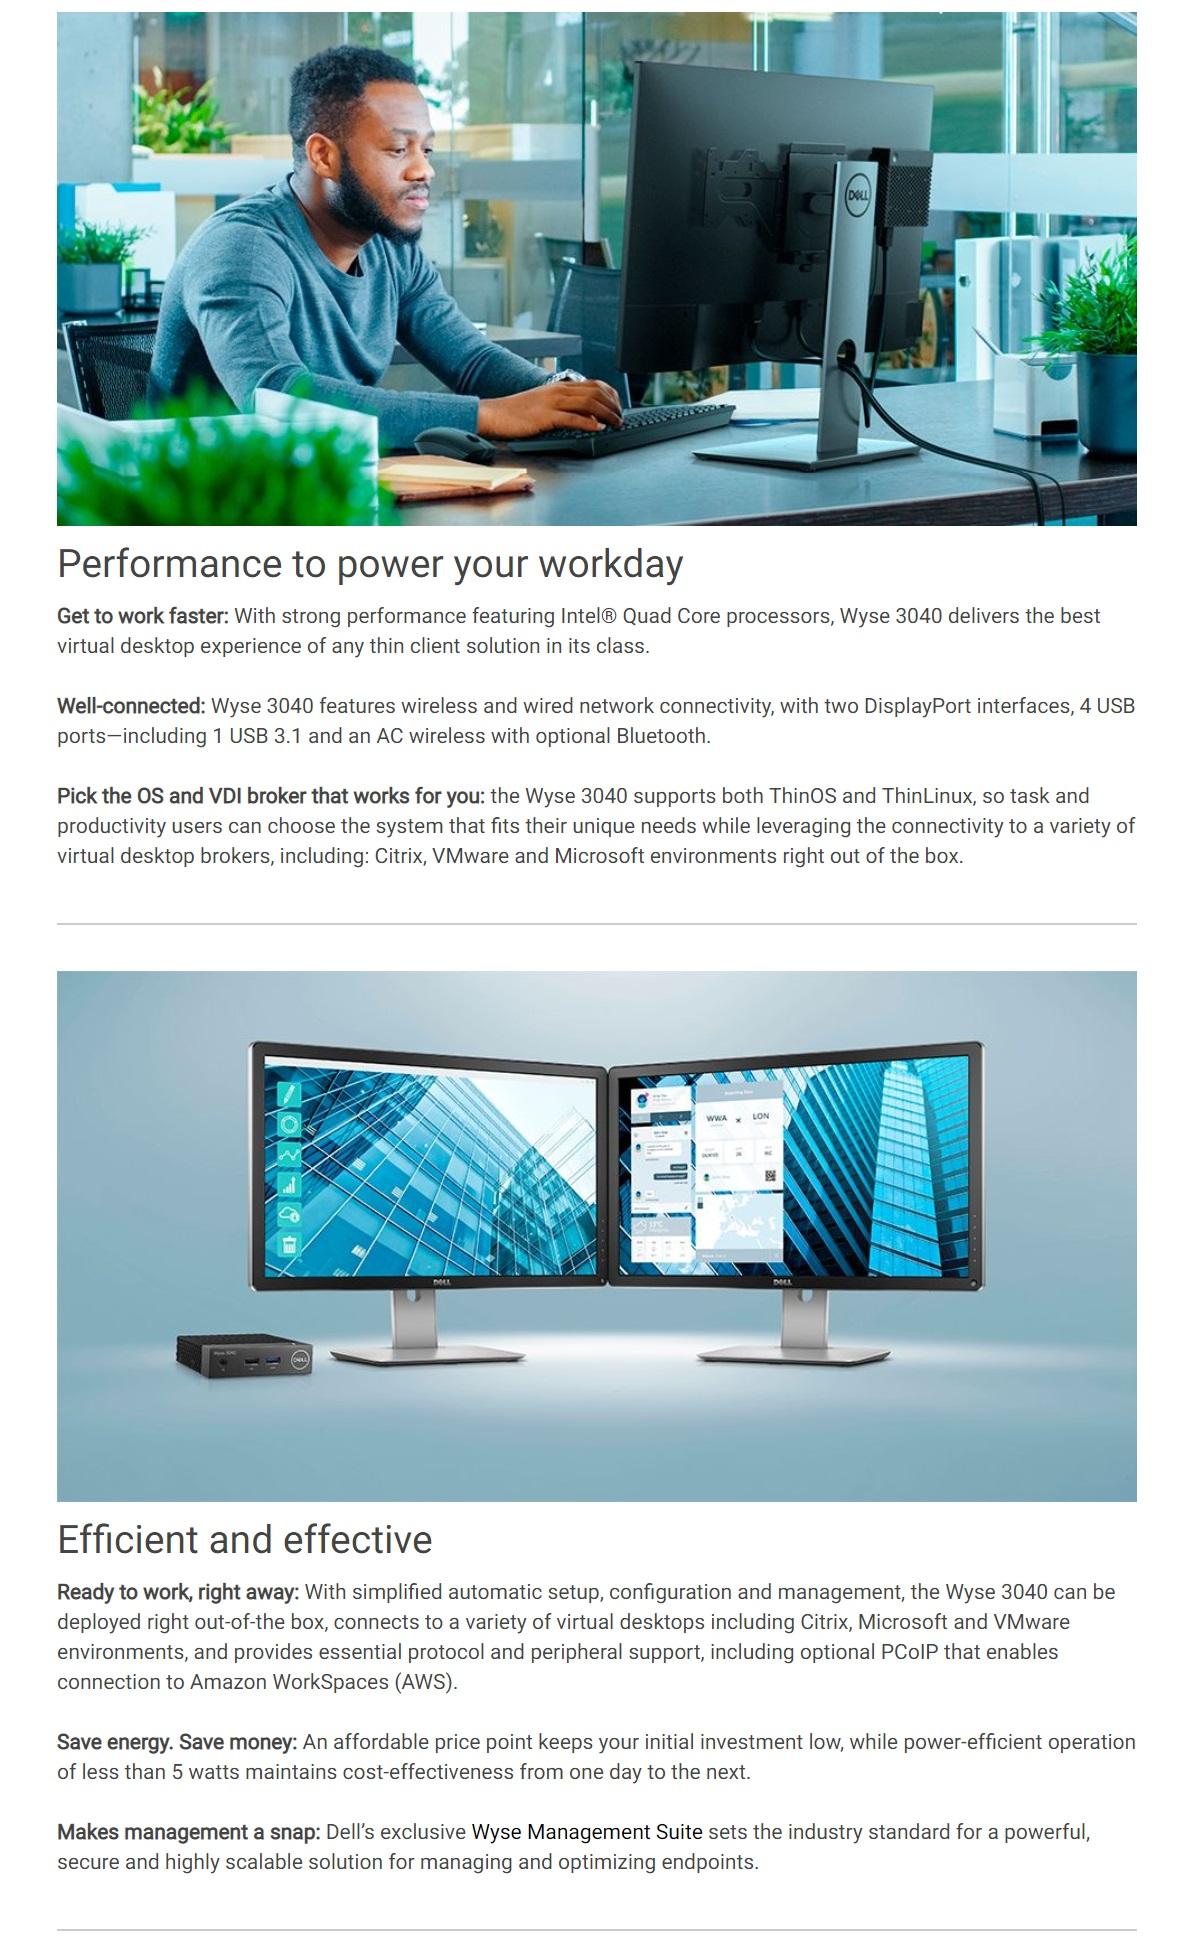 Dell Wyse 3040 Thin Client Atom x5-Z8350 2GB 8GB ThinOS Desktop PC